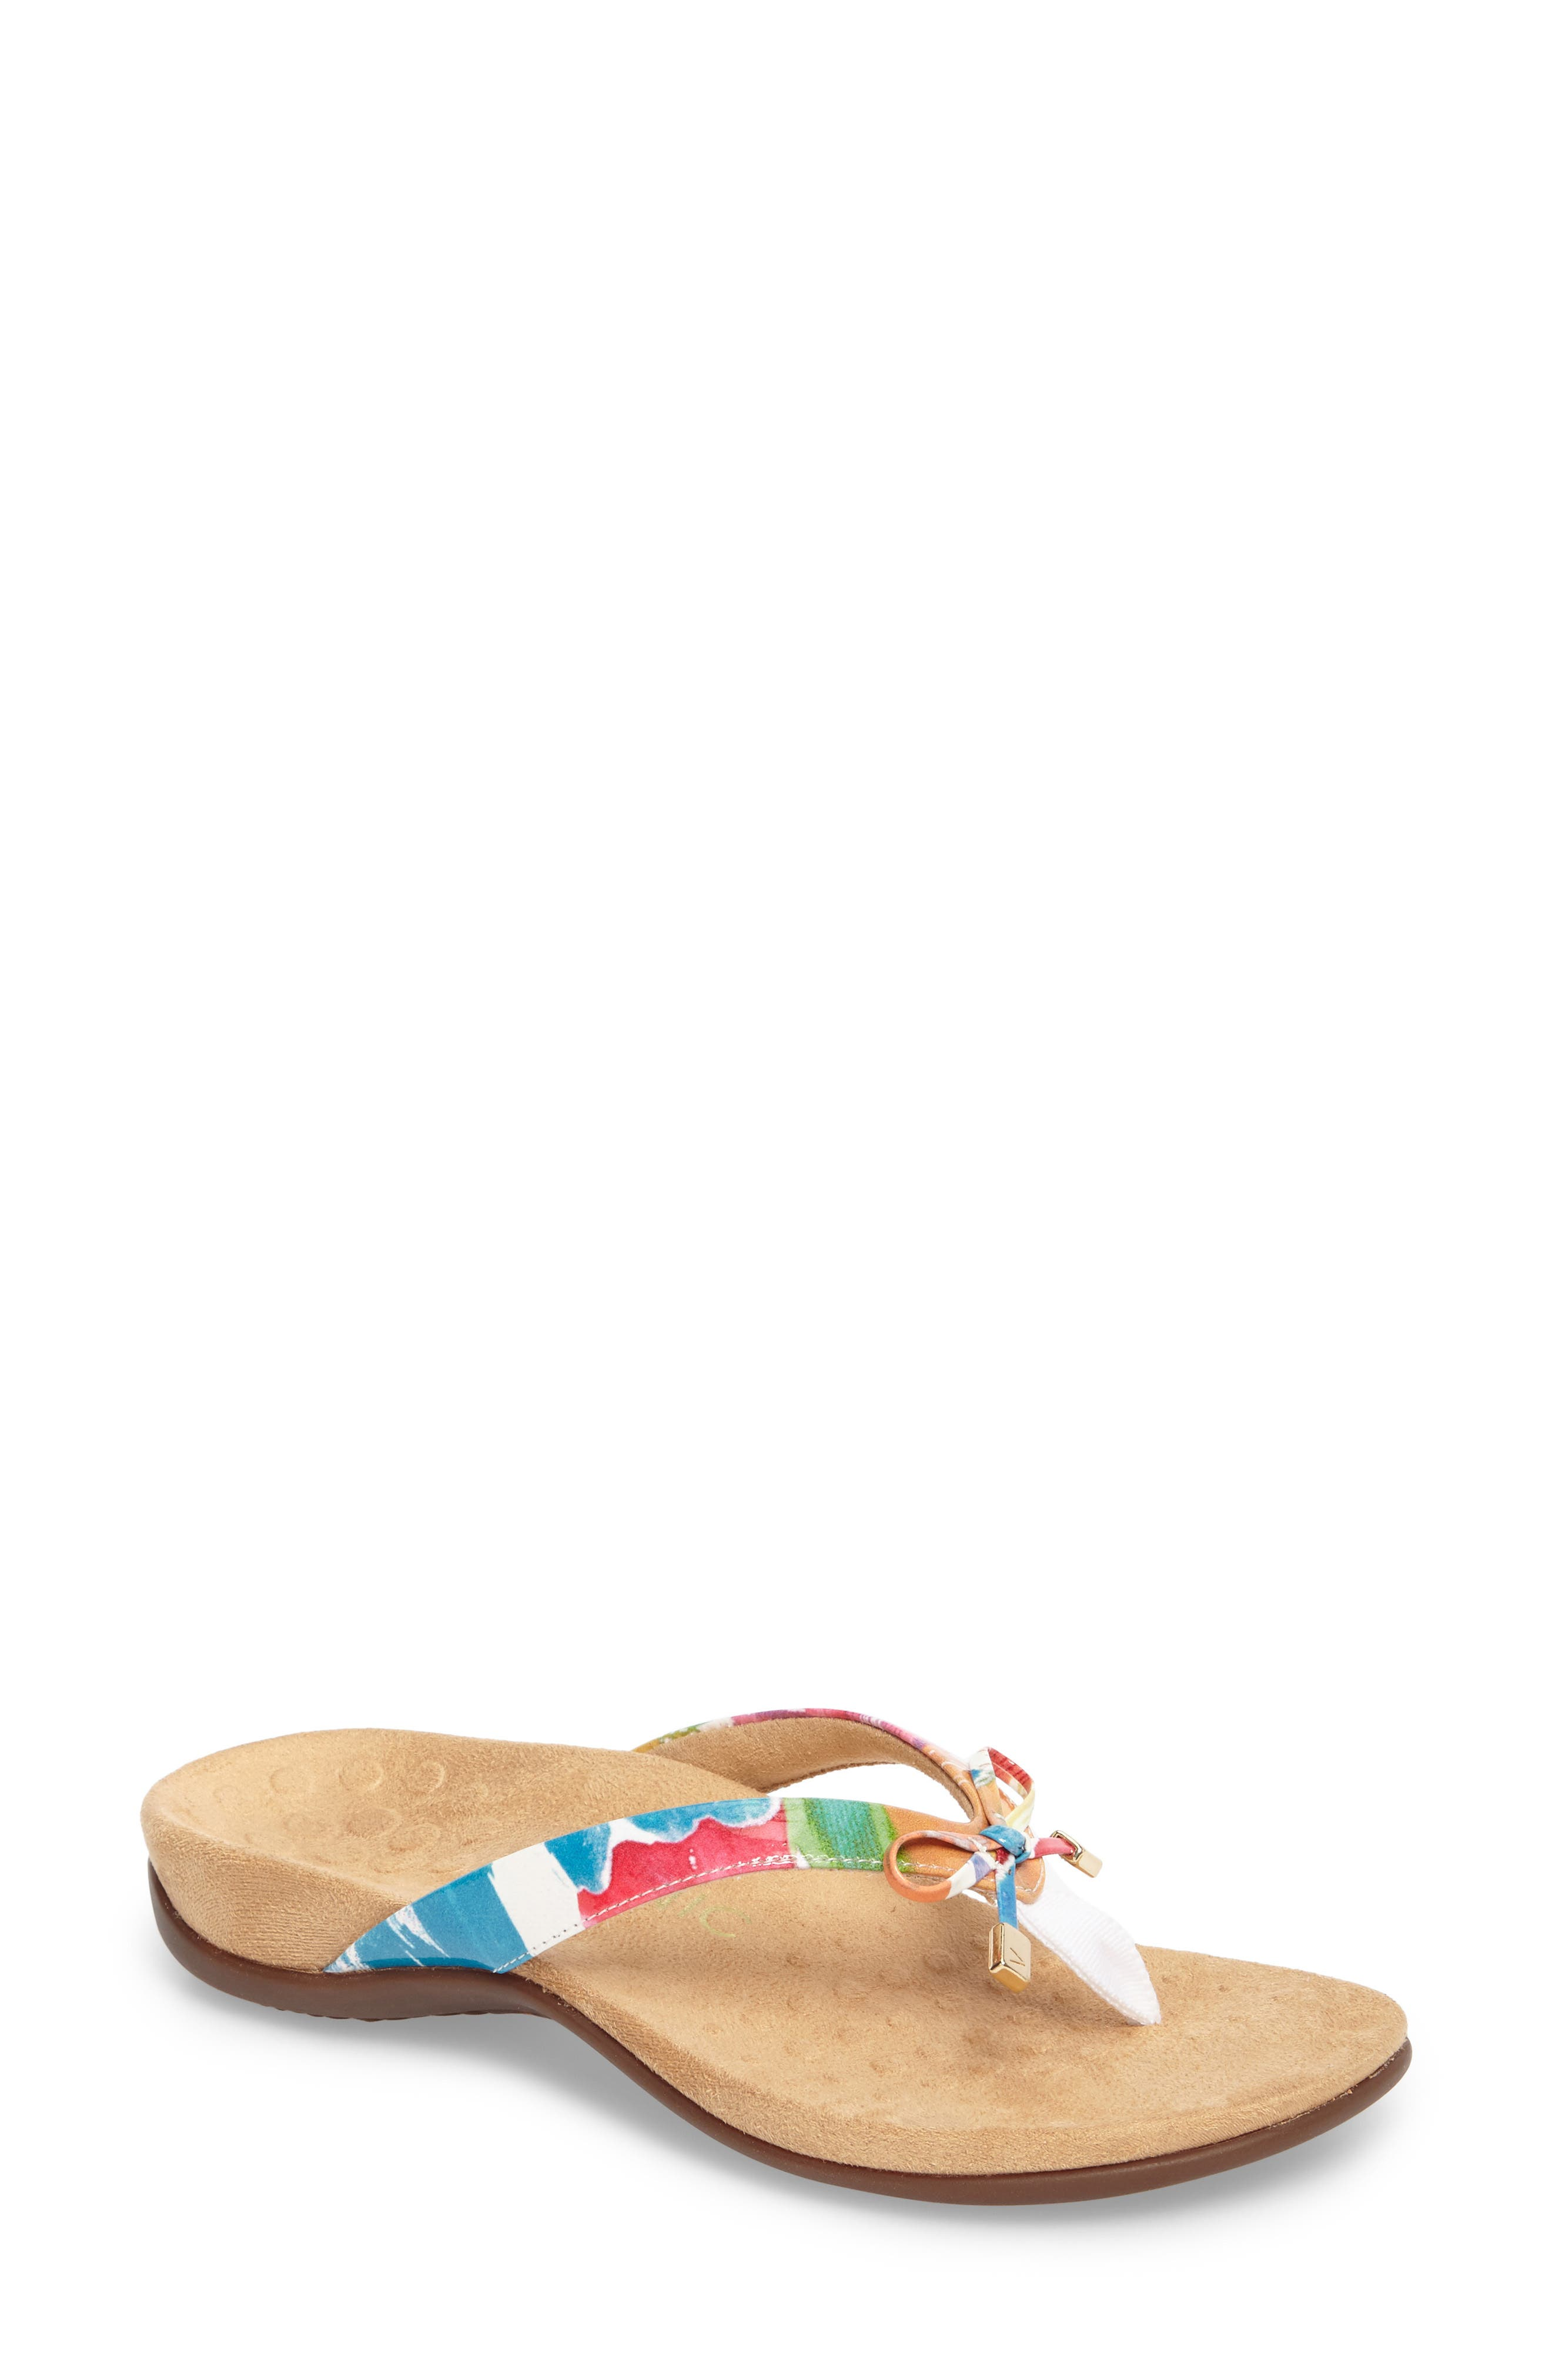 VIONIC 'Bella II' Sandal, Main, color, WHITE FLORAL FAUX LEATHER